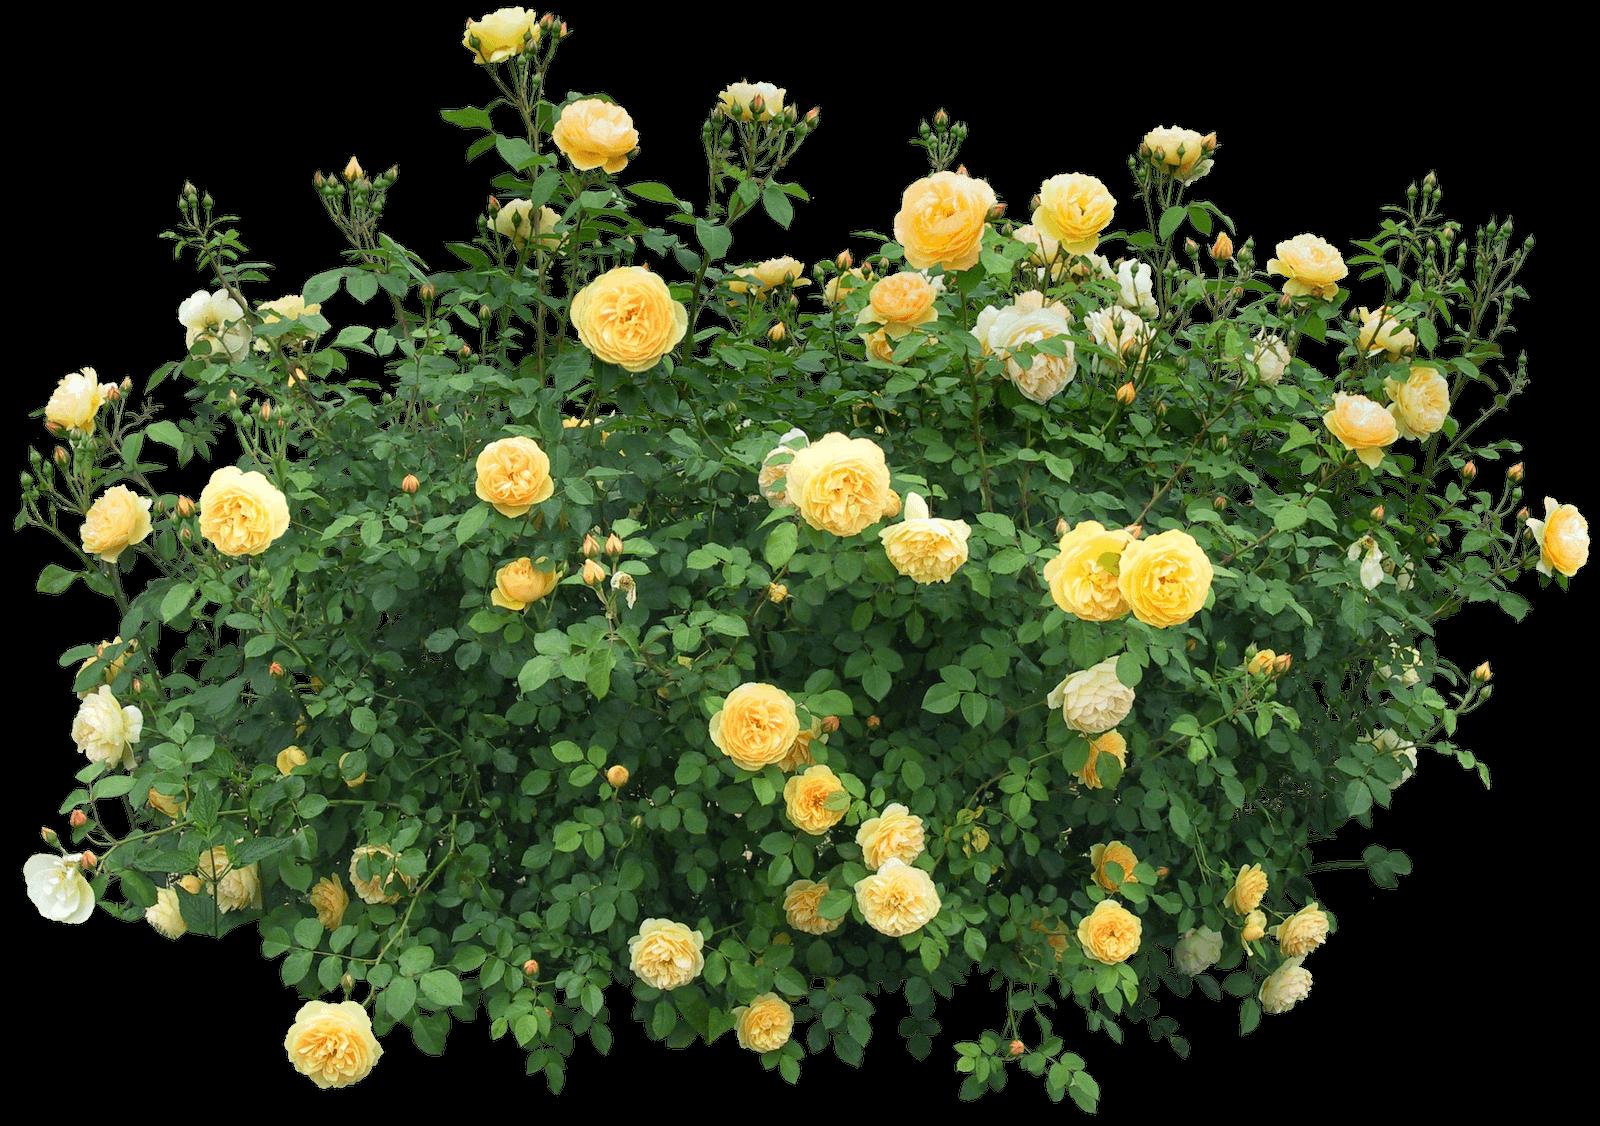 Yellow Roses Bush transparent PNG - StickPNG for Plant Transparent Png  58lpg